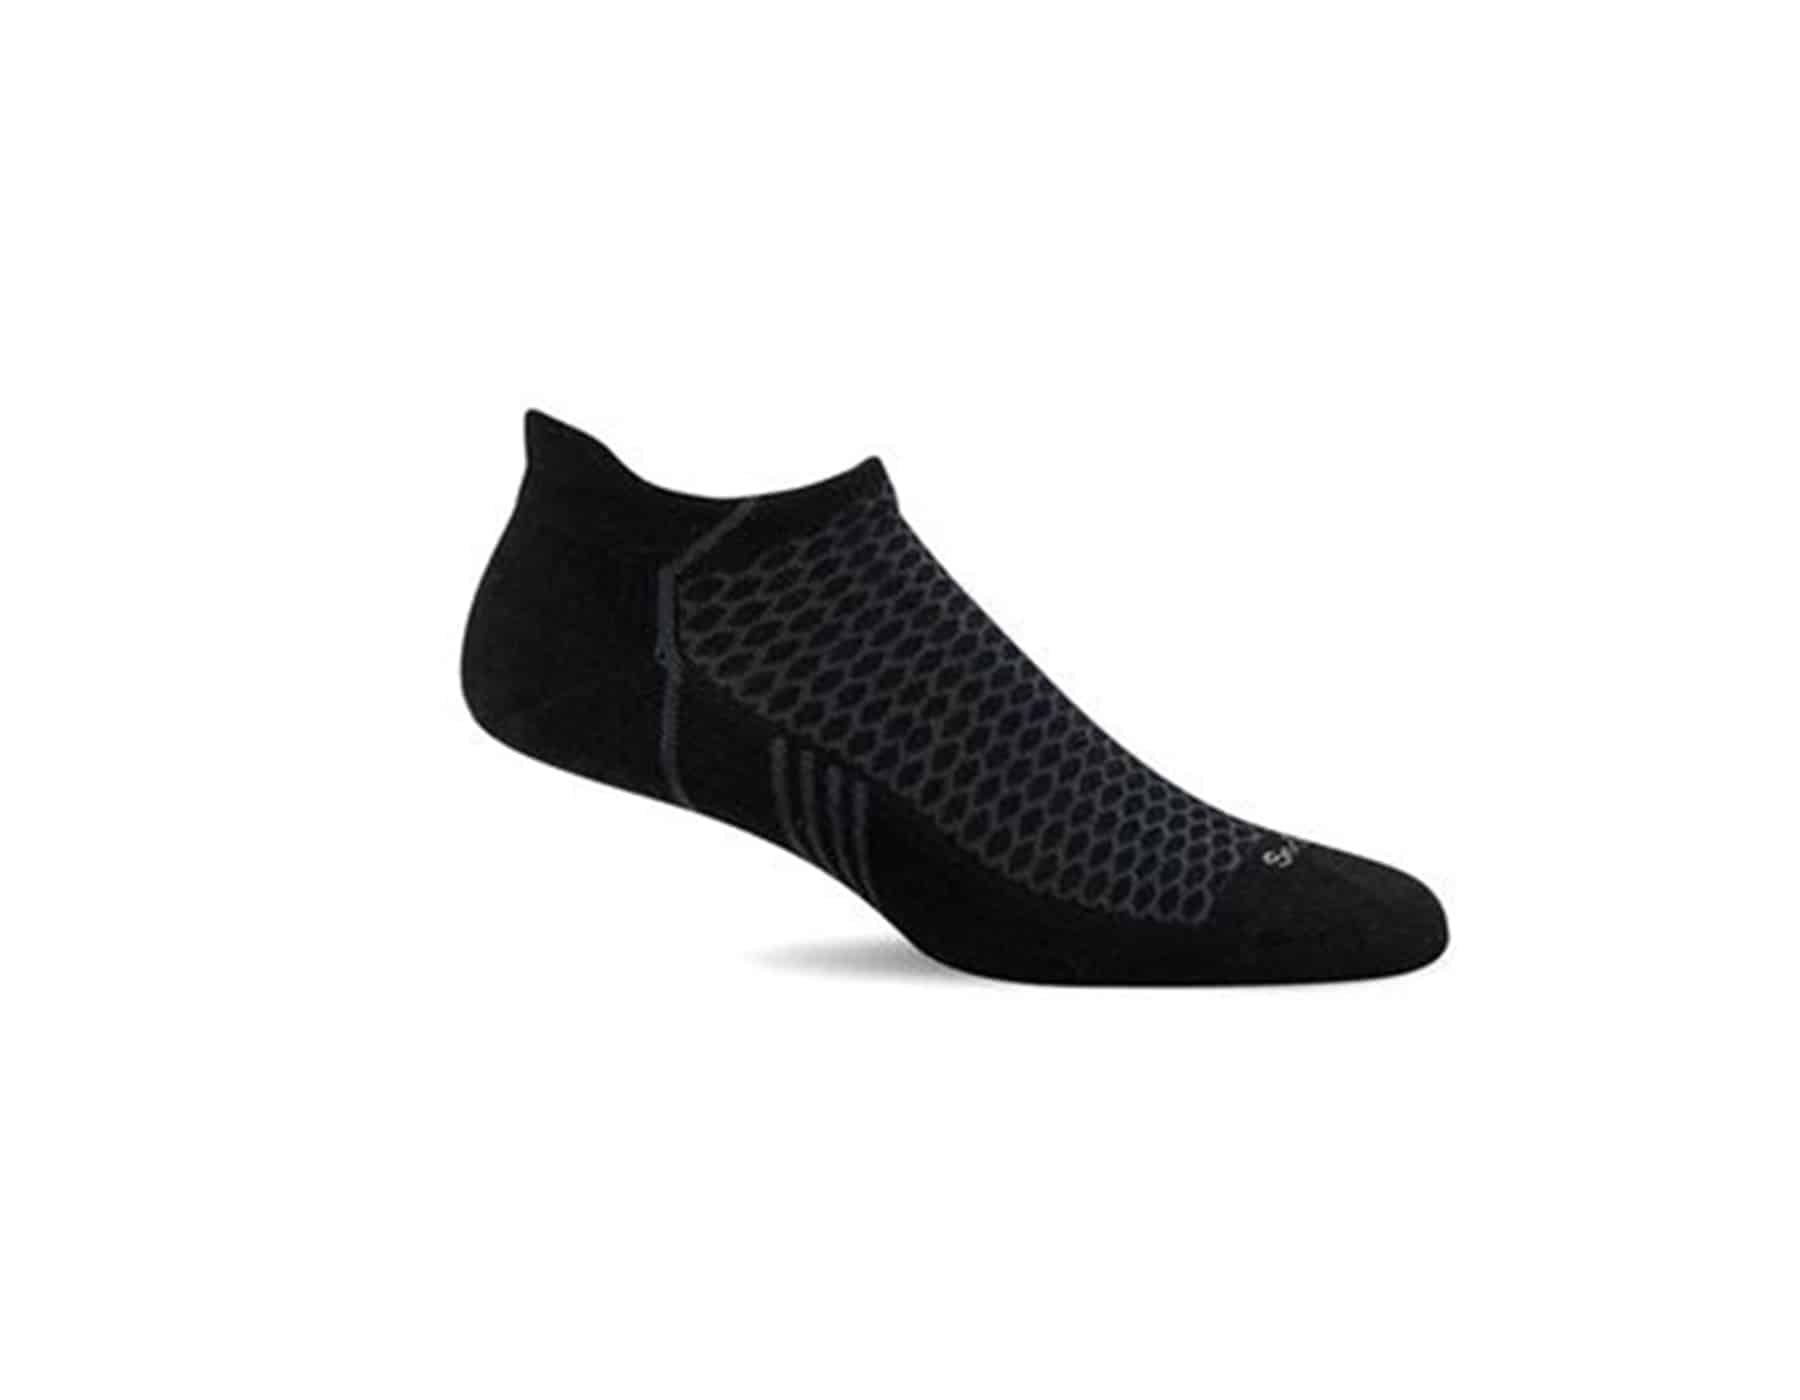 Sockwell Kompressionssocken Incline Micro für Damen Sportsocken